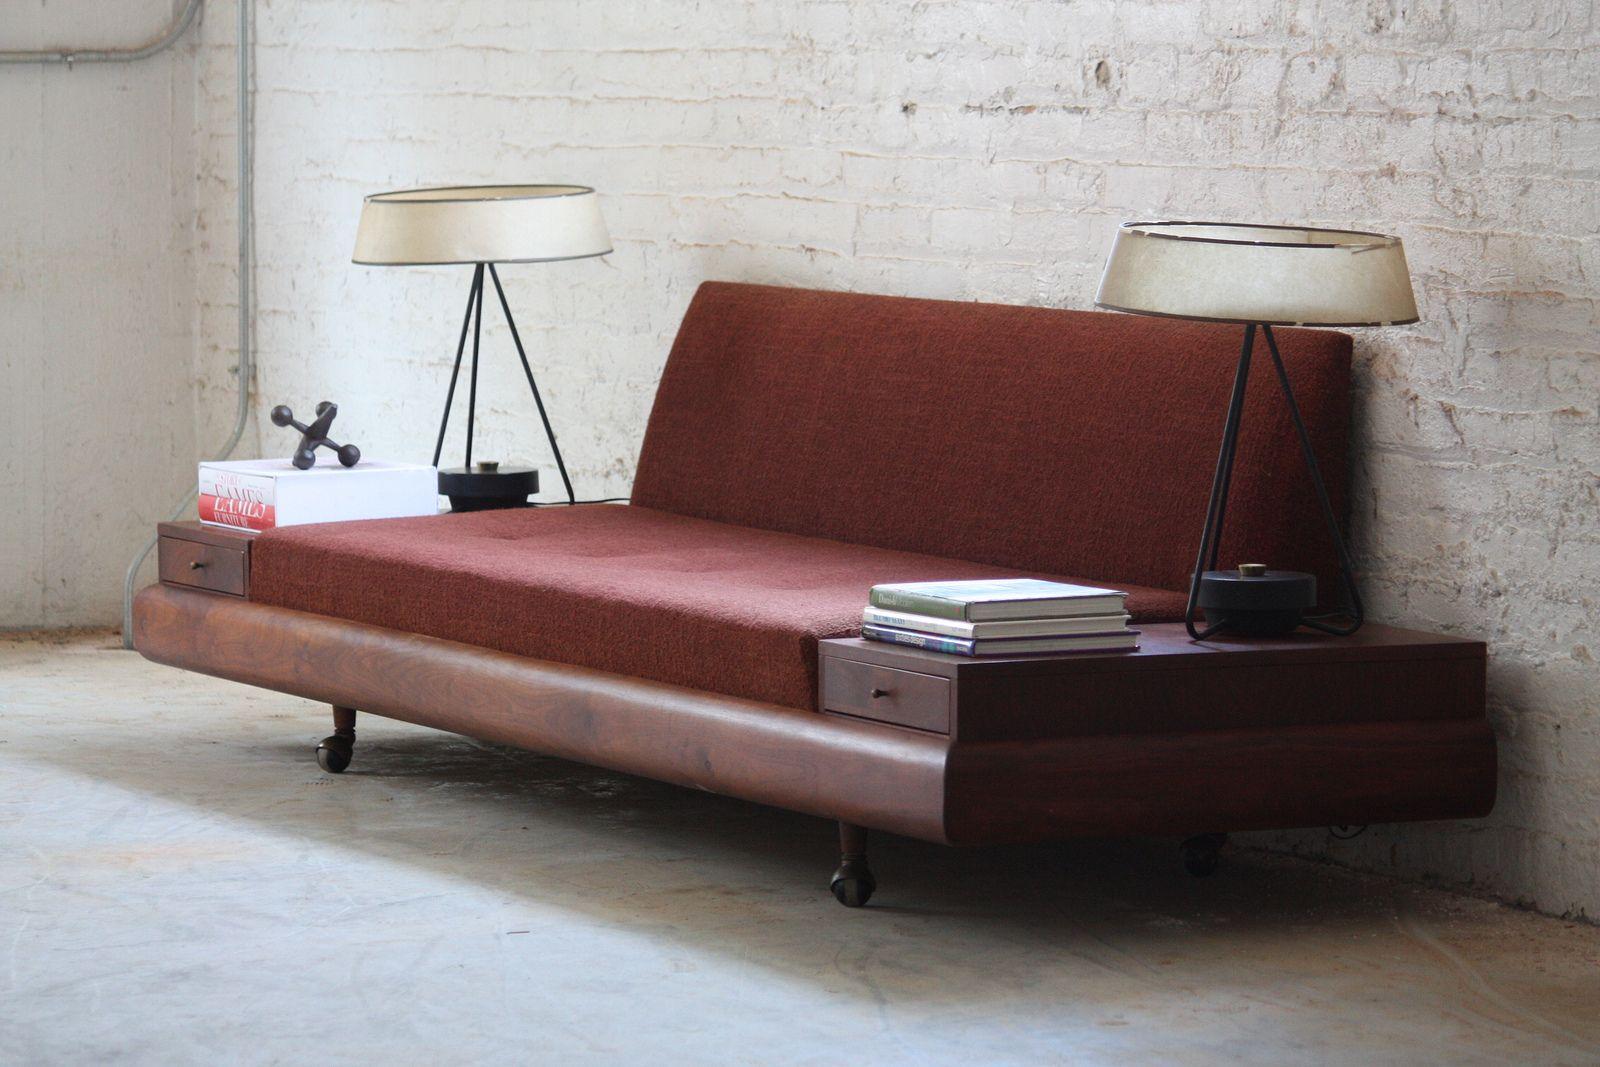 Liberating adrian pearsall mid century modern platform sofa model 1709 s for craft associates u s a 1960s by kennykk2modern com